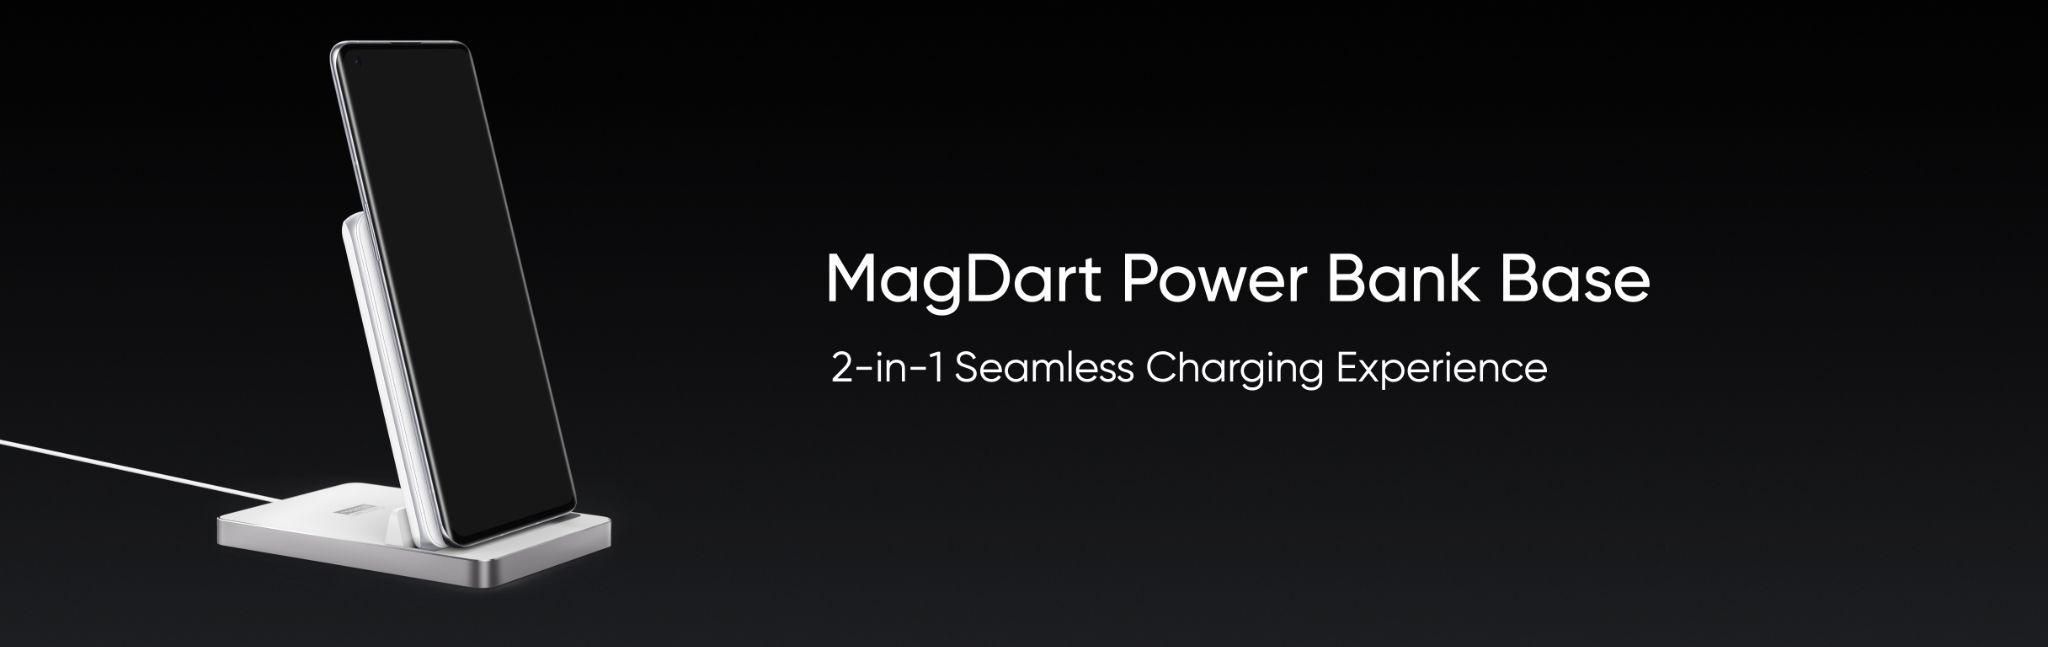 realme MagDart Power Bank